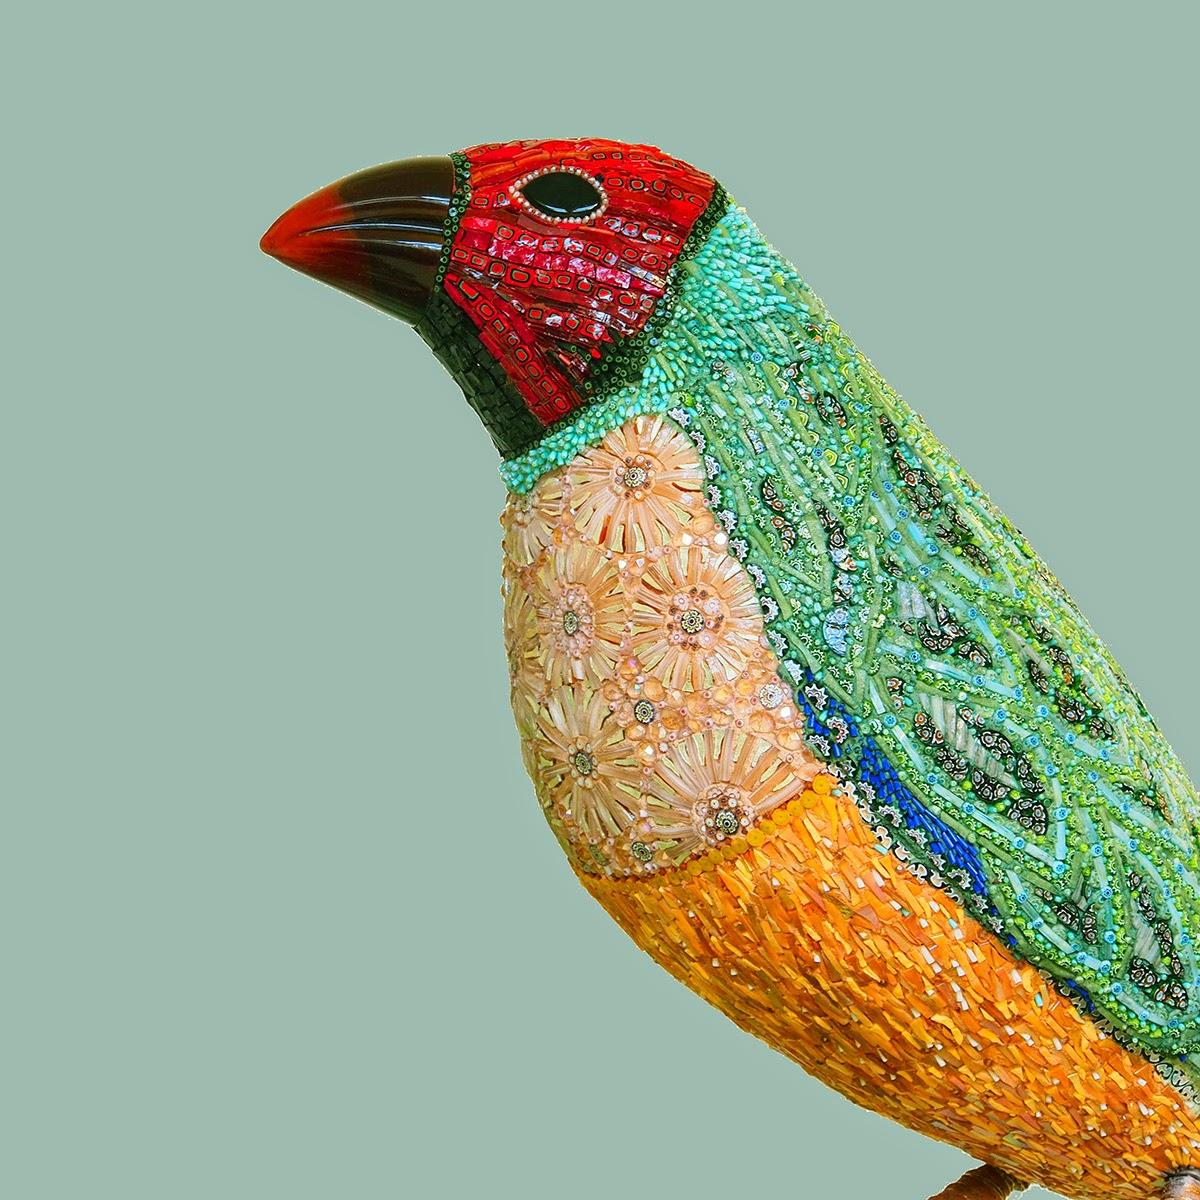 Simply Creative: Beautiful Mosaic Bird Sculptures by Dusciana Bravura